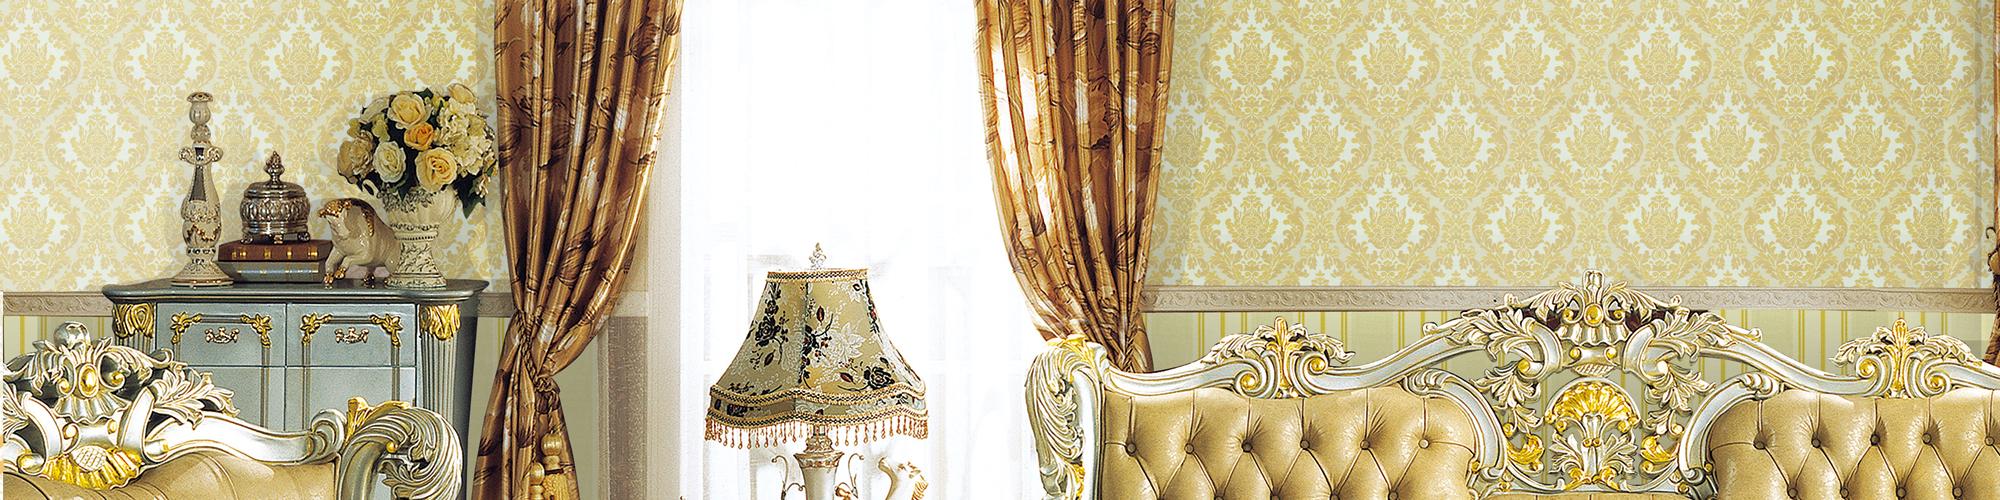 Wallpaper manufacturers my blog for Wallpaper manufacturers